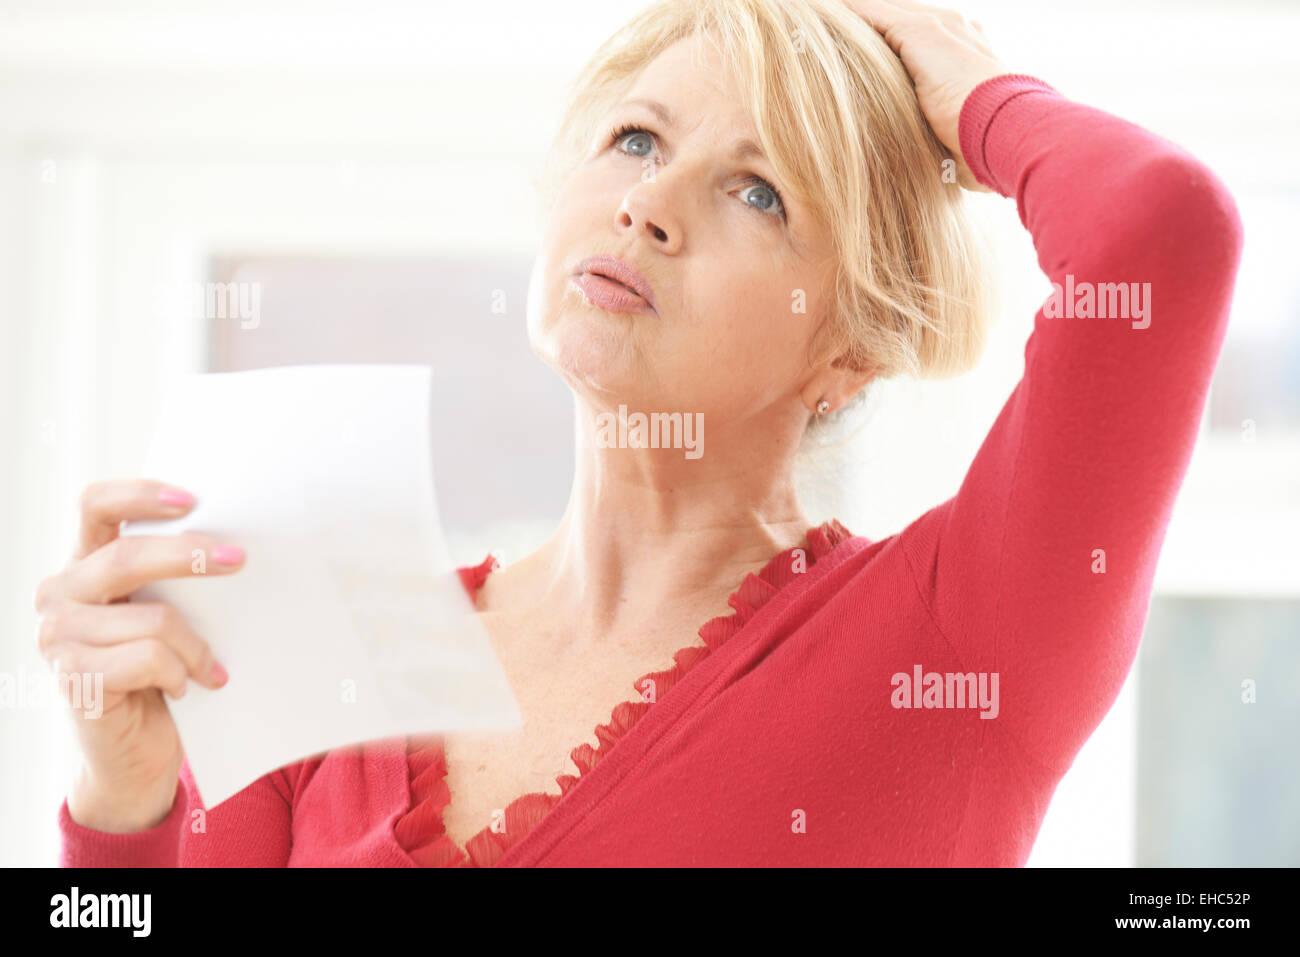 Mujer madura experimentando sofocos de menopausia Foto de stock